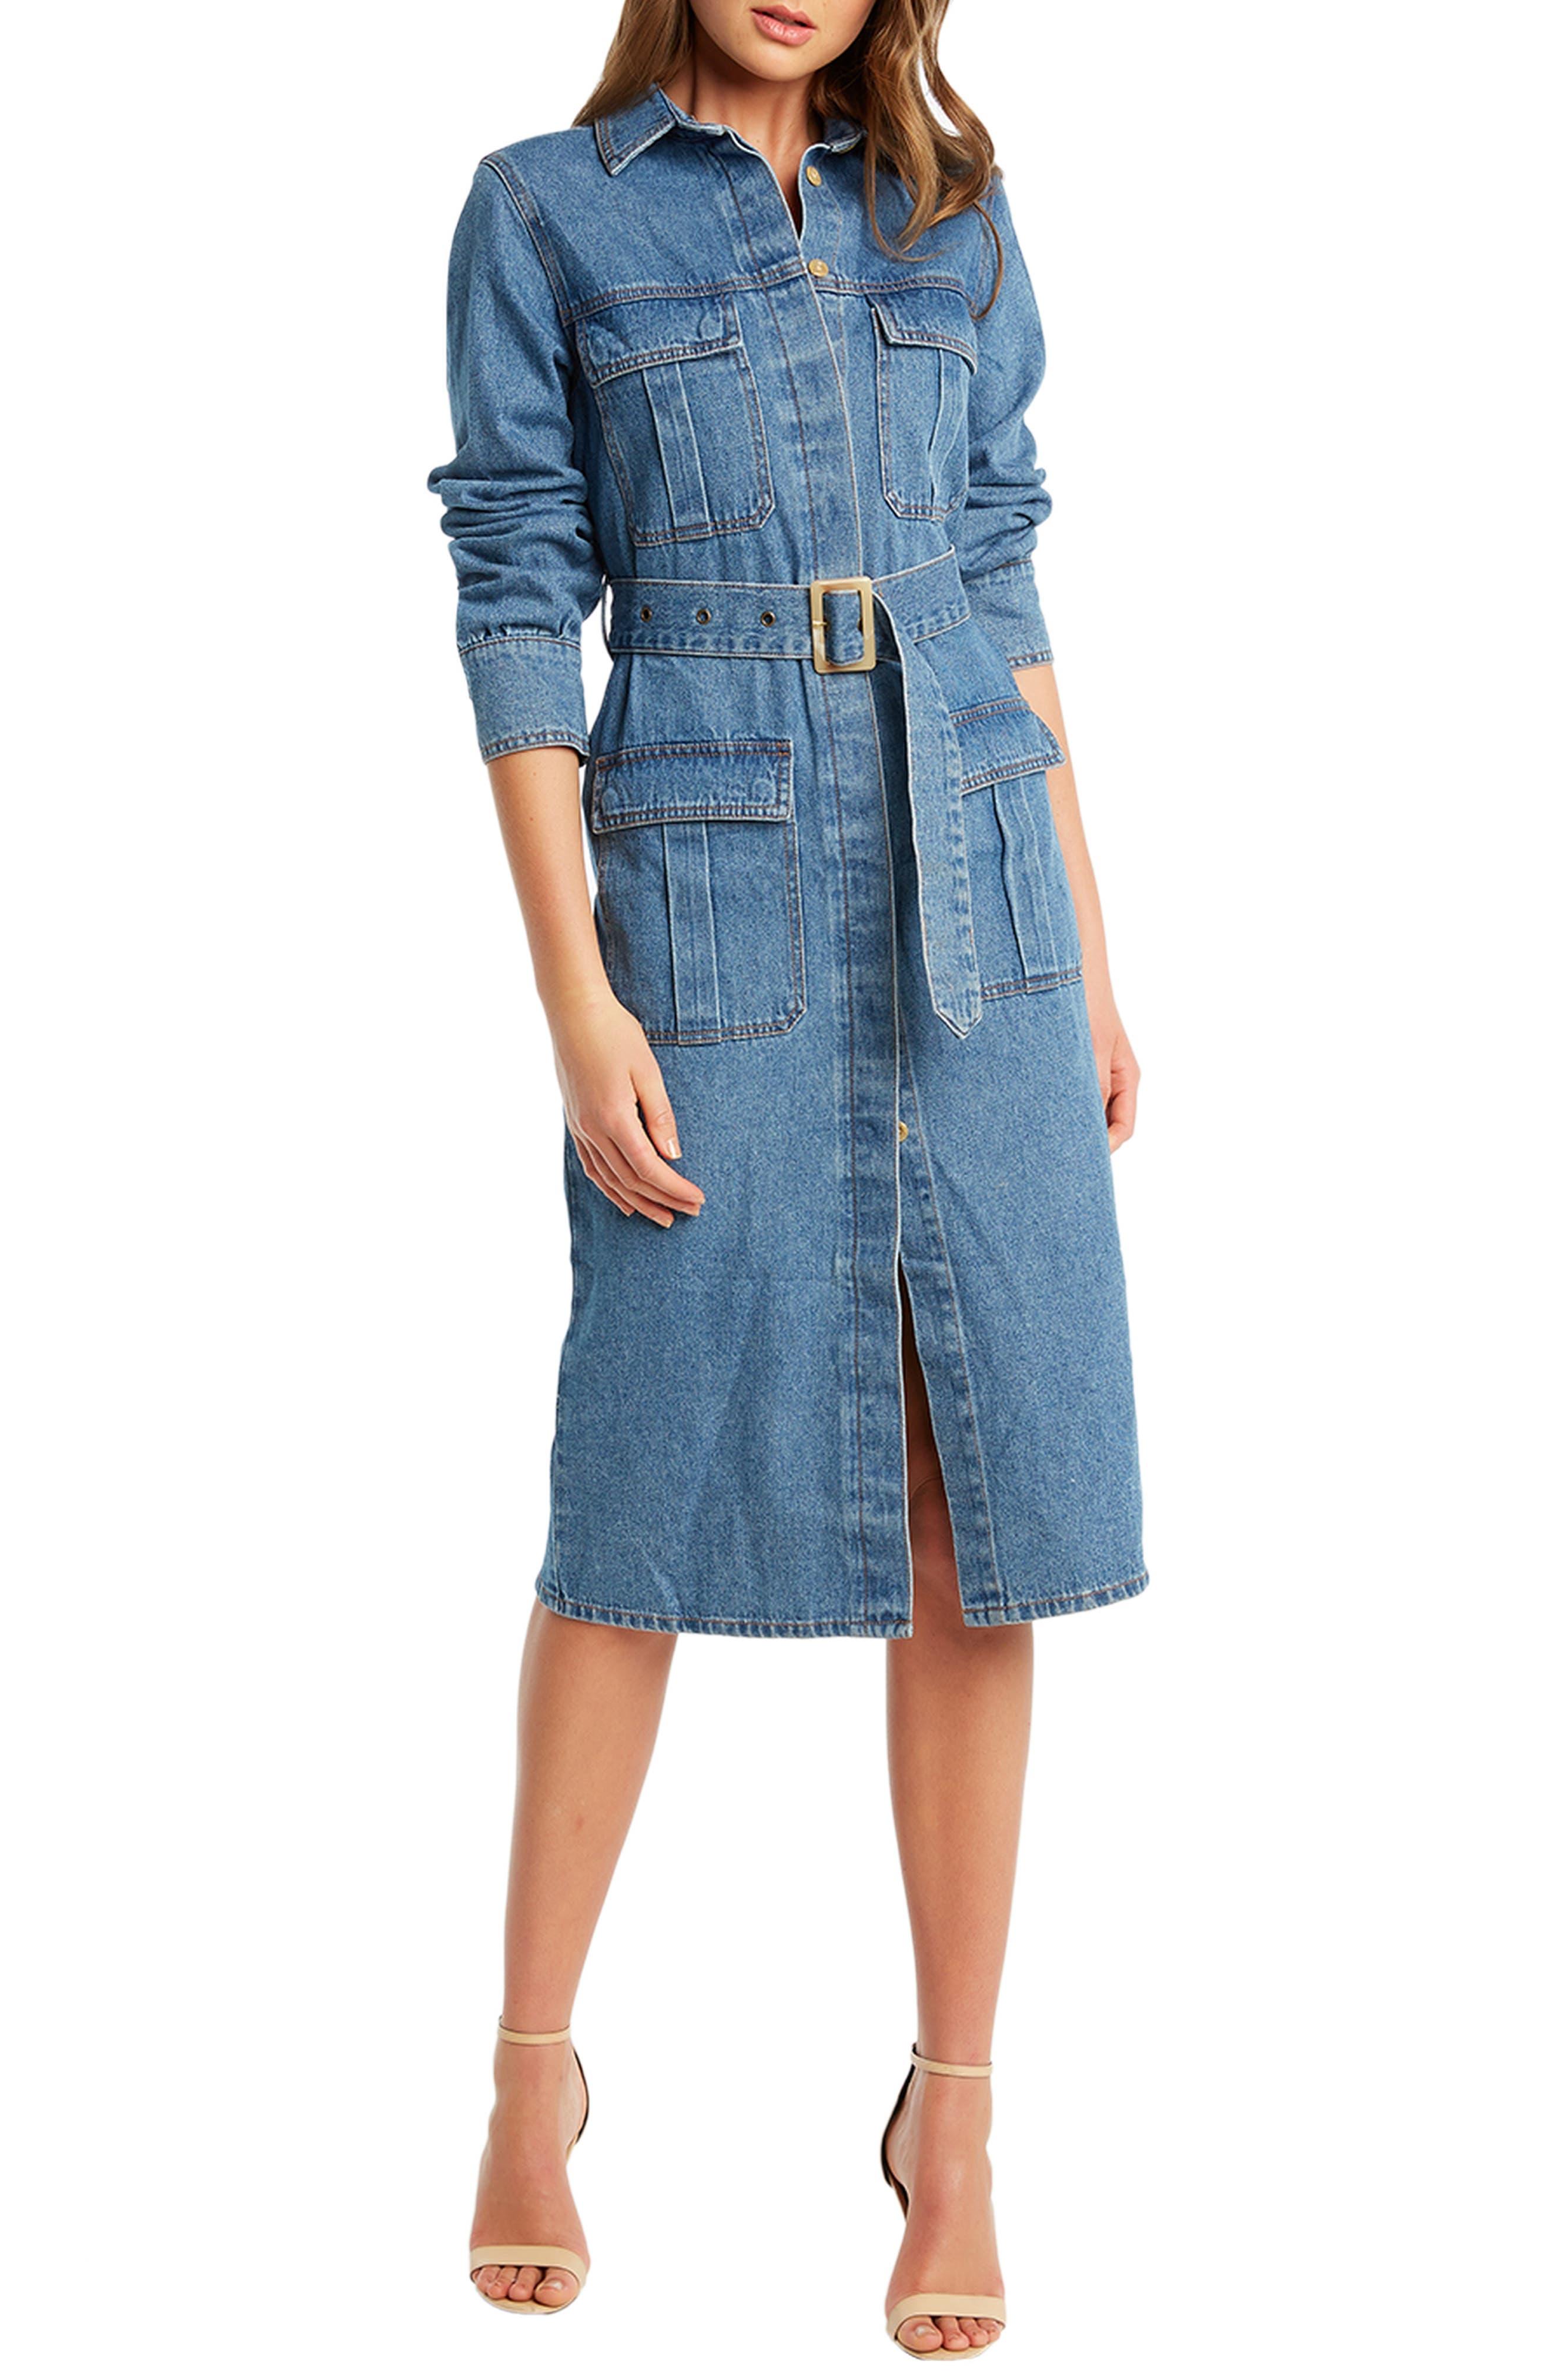 70s Outfits – 70s Style Ideas for Women Womens Bardot Long Sleeve Denim Shirtdress $109.00 AT vintagedancer.com